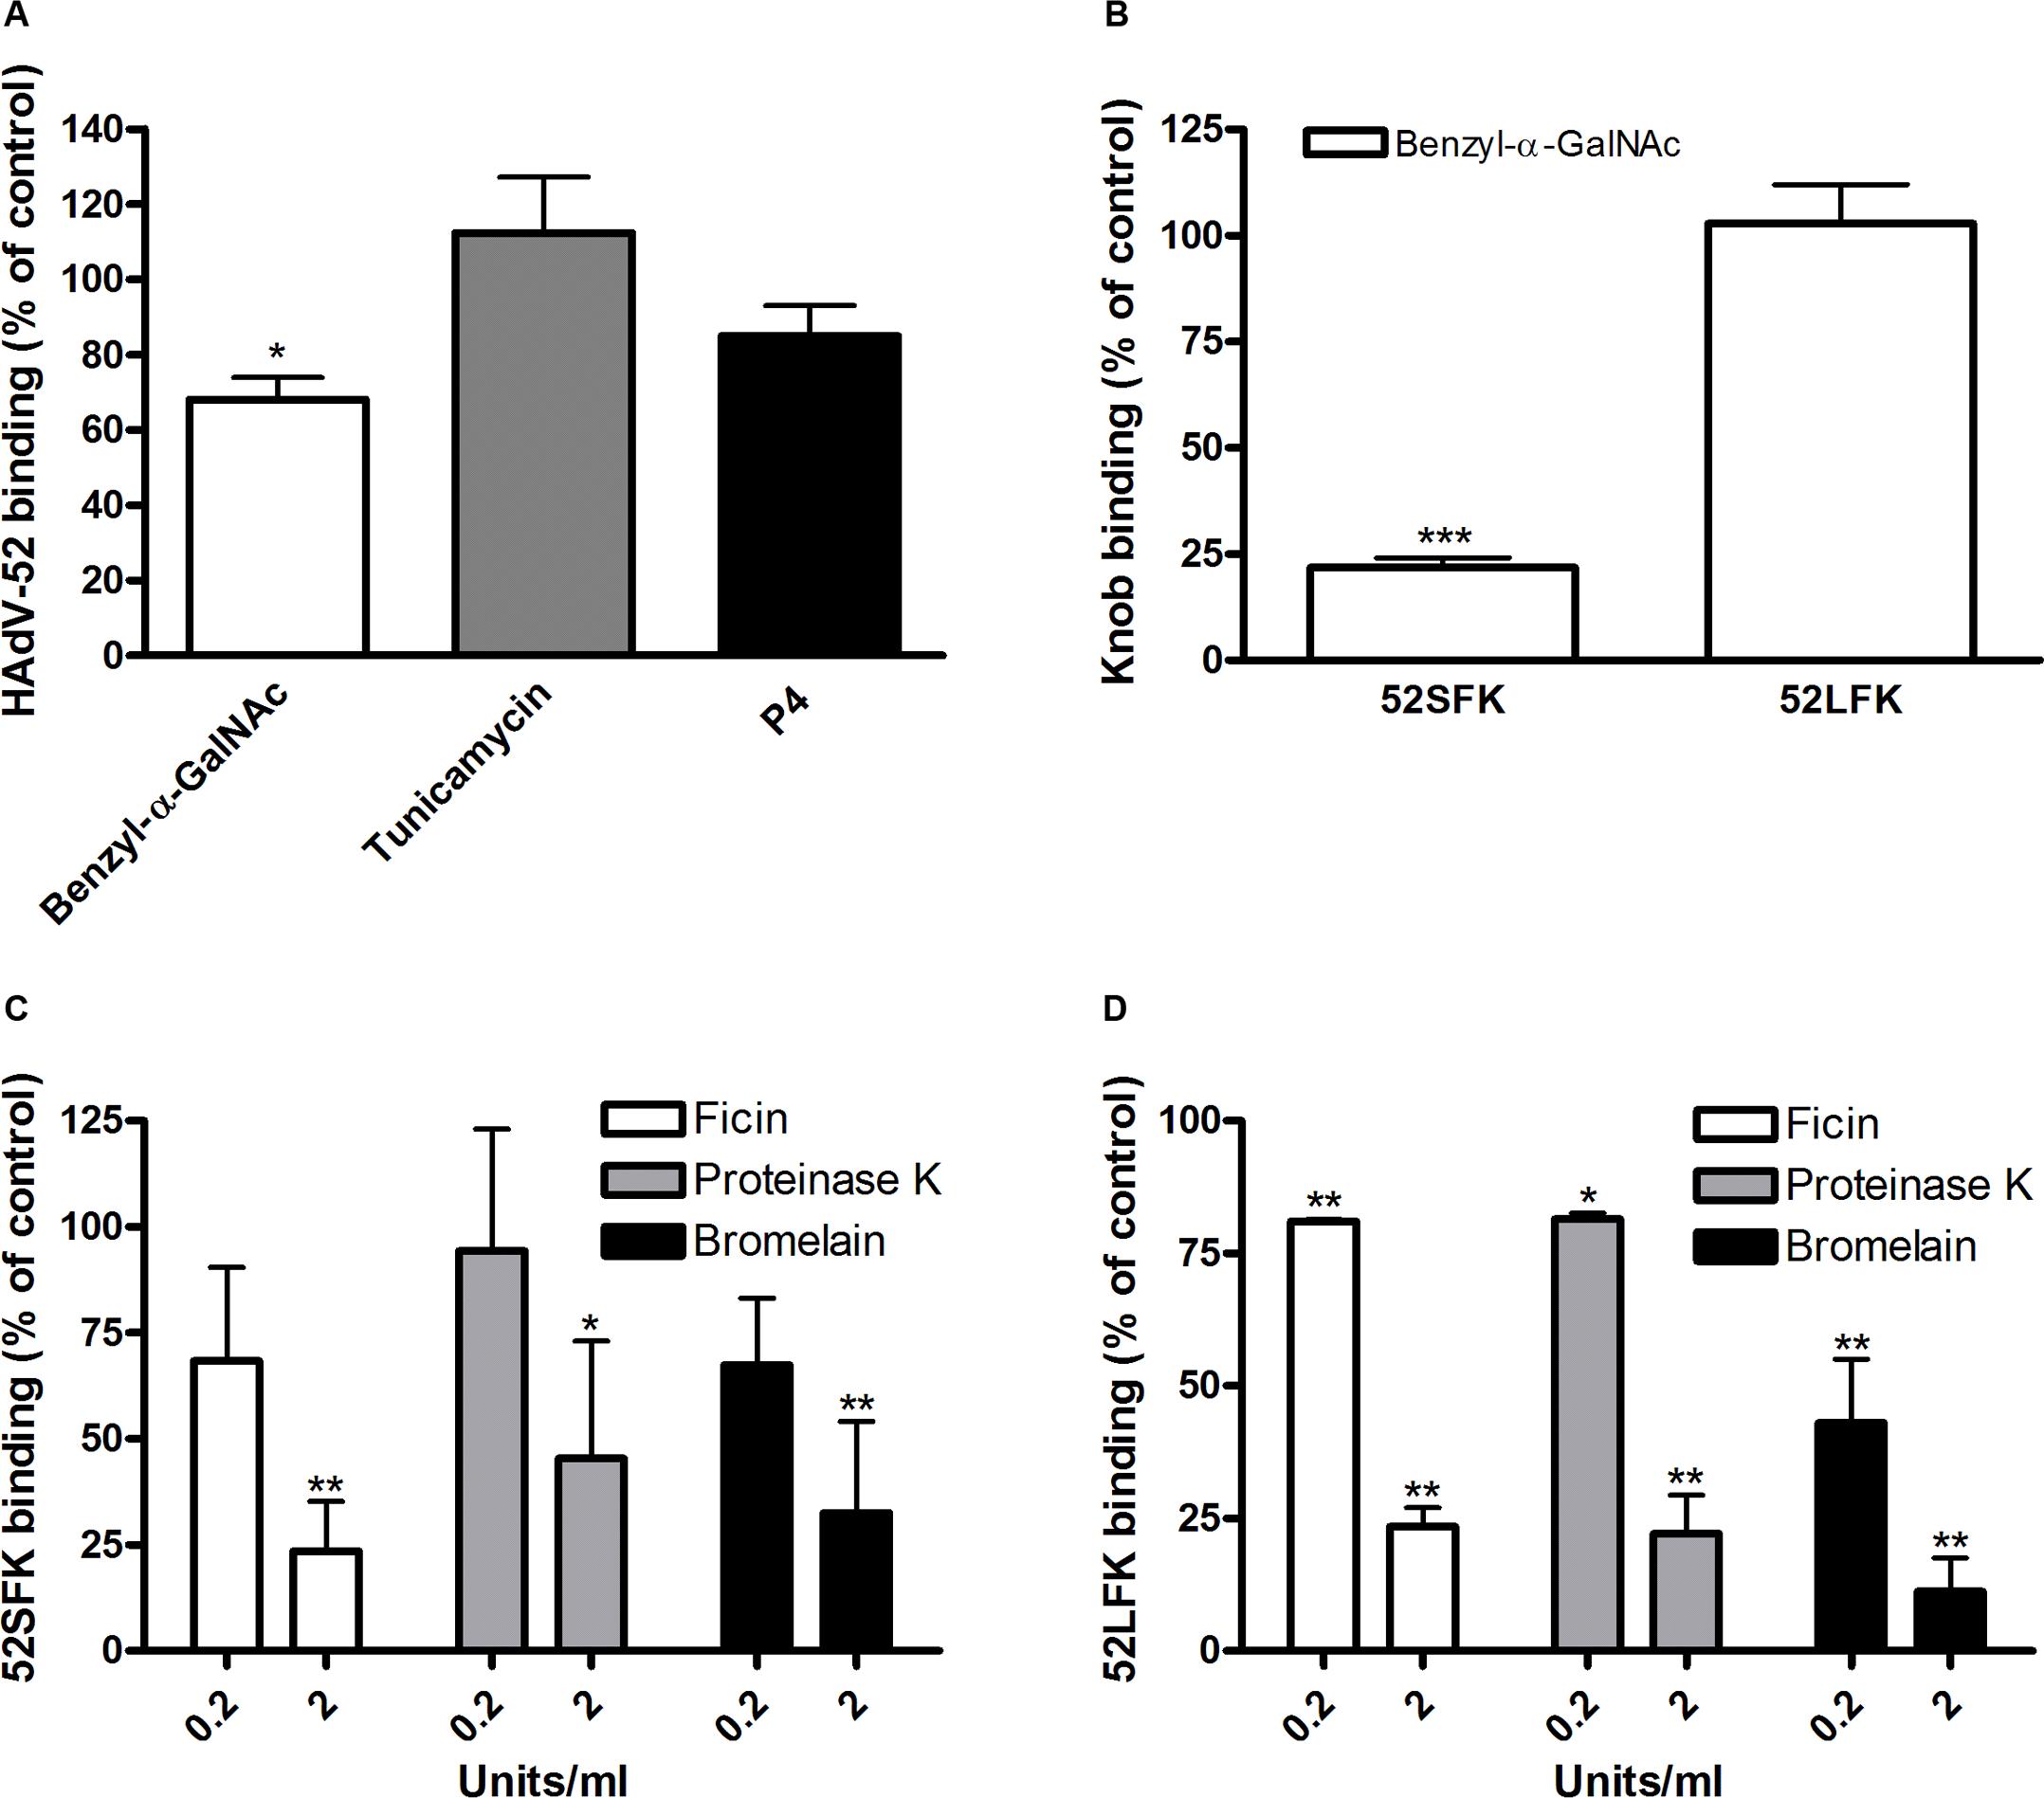 HAdV-52 short fiber knob binds to <i>O</i>-linked glycoproteins on A549 cells.